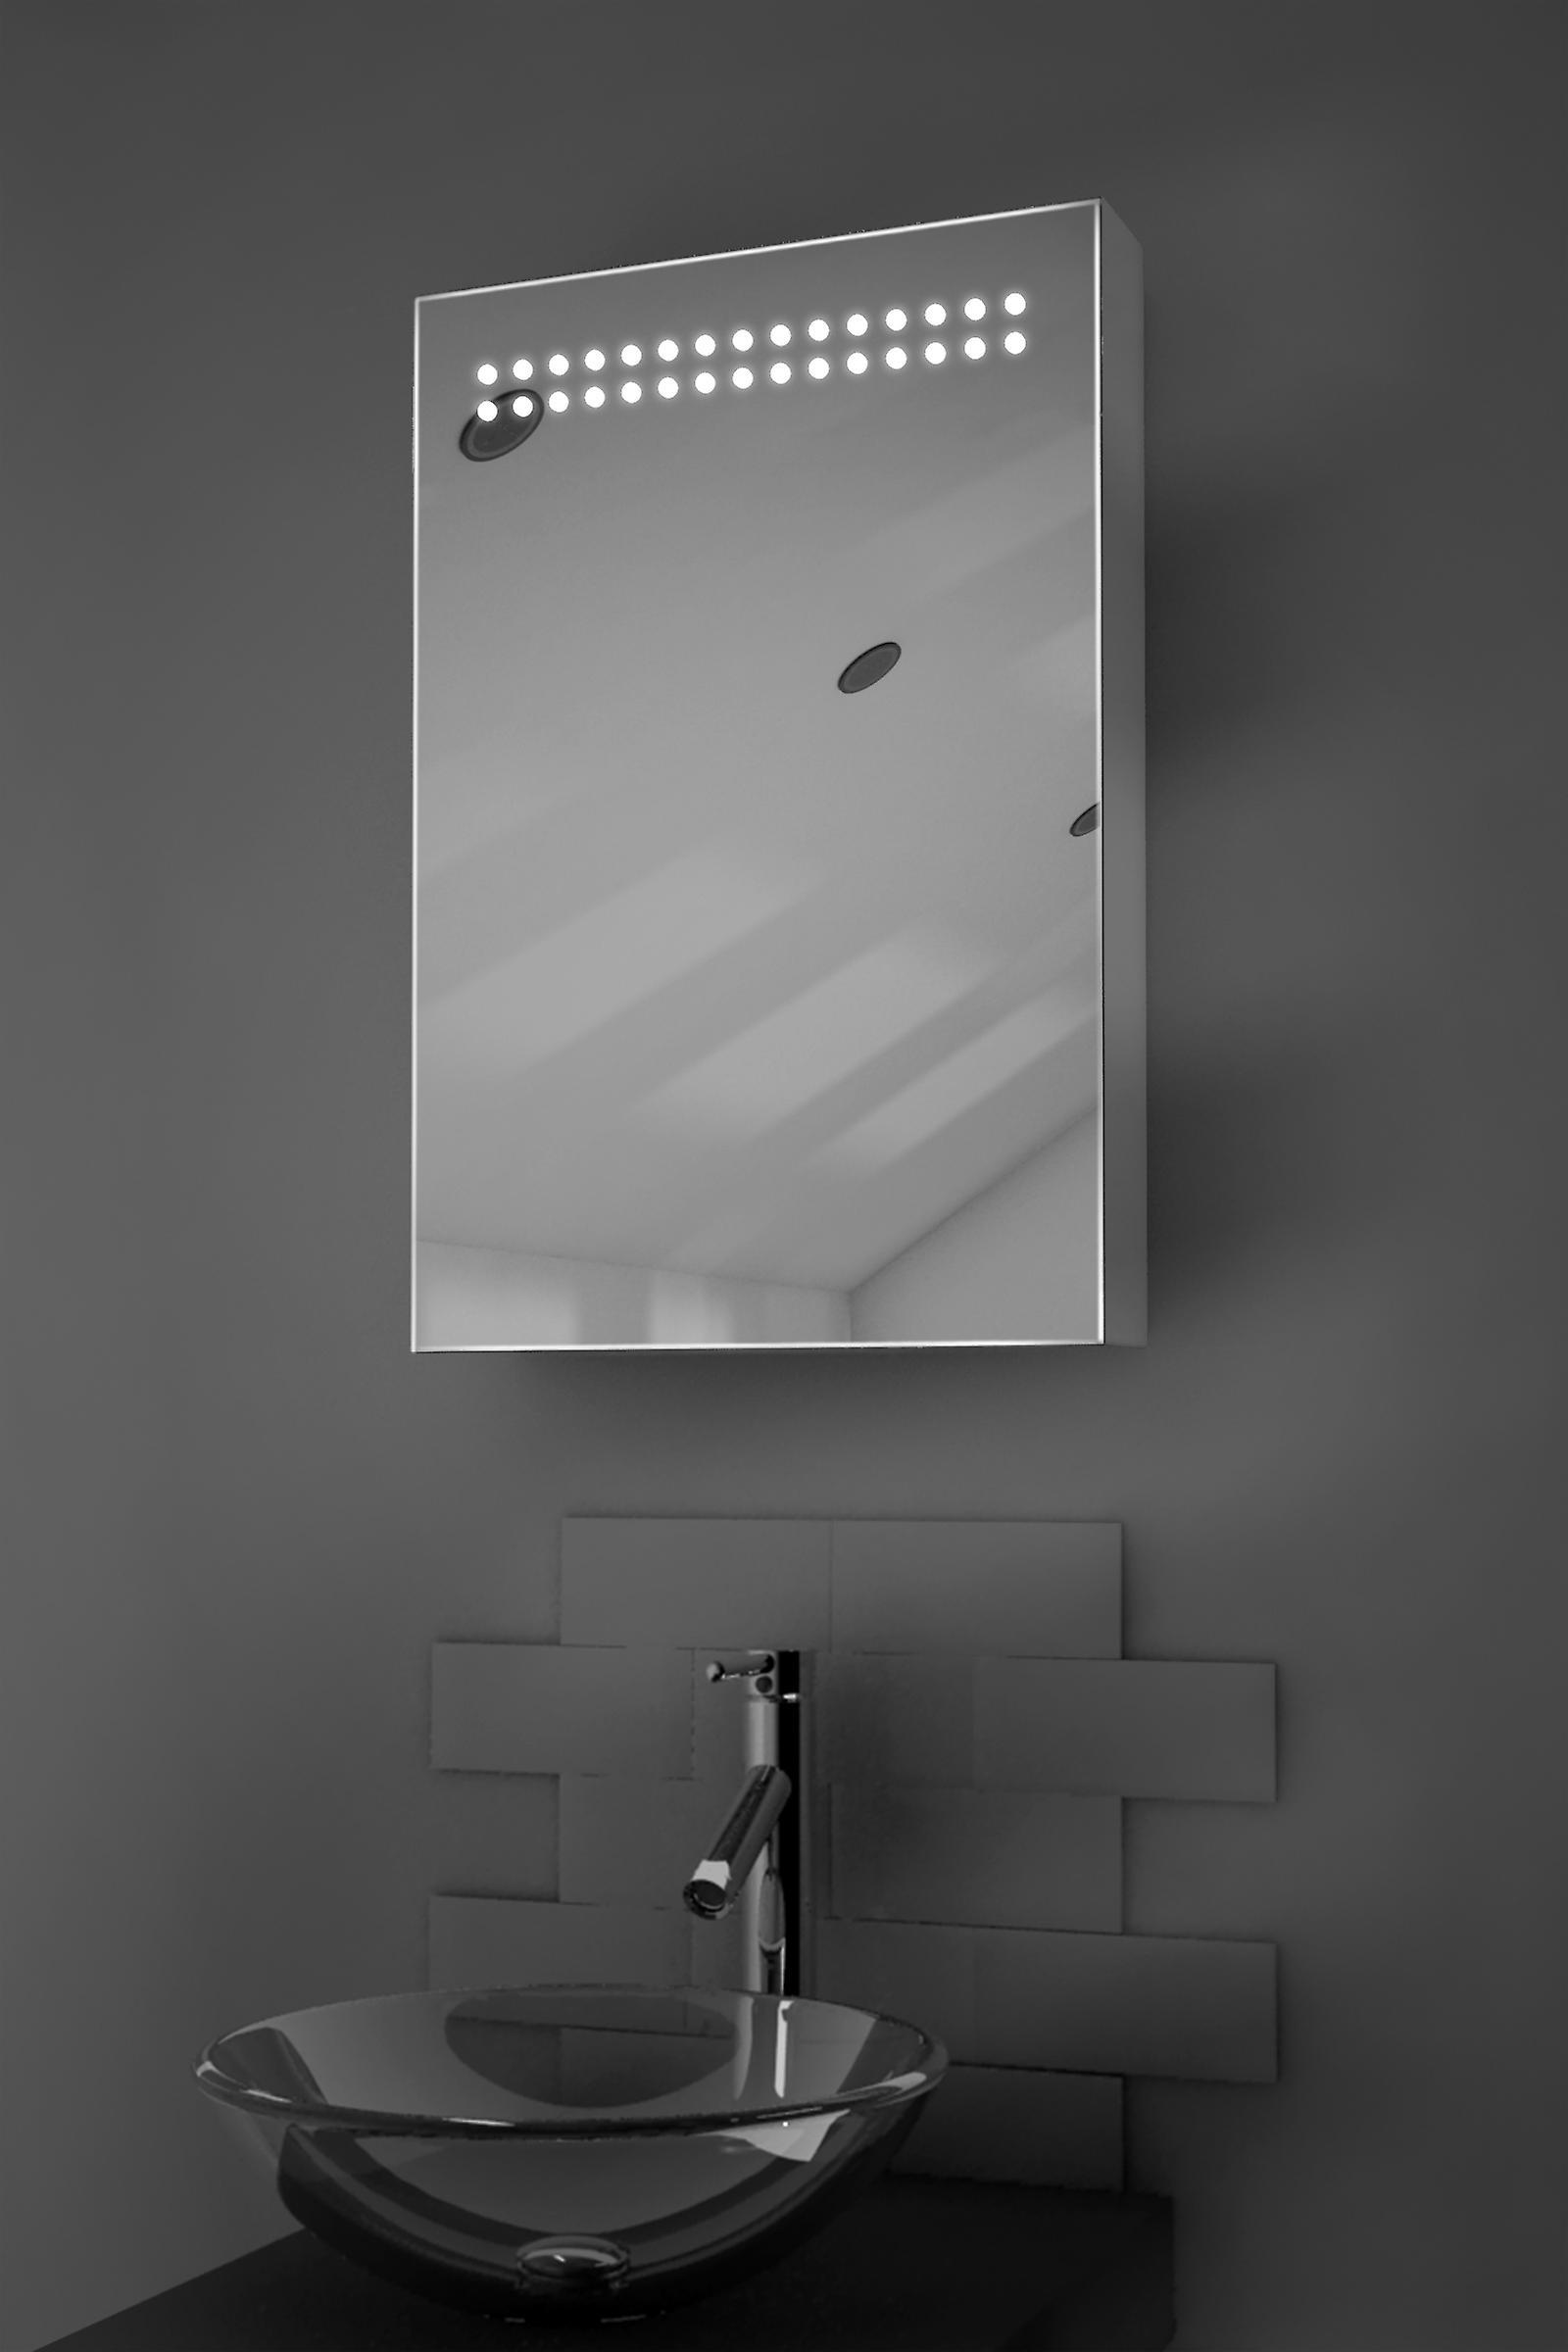 Jewel LED Illuminated Bathroom Cabinet With Sensor & Shaver k255